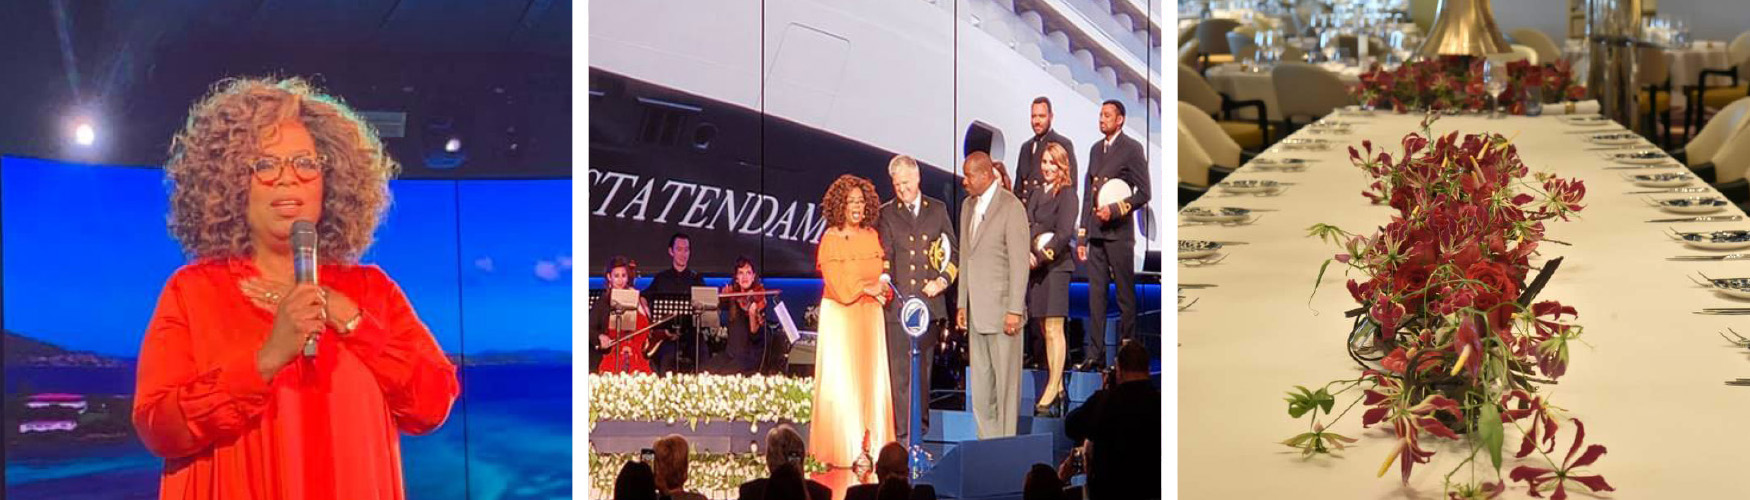 Cruise-Ship-Flowers-Oprah-Holland-America-1.jpg